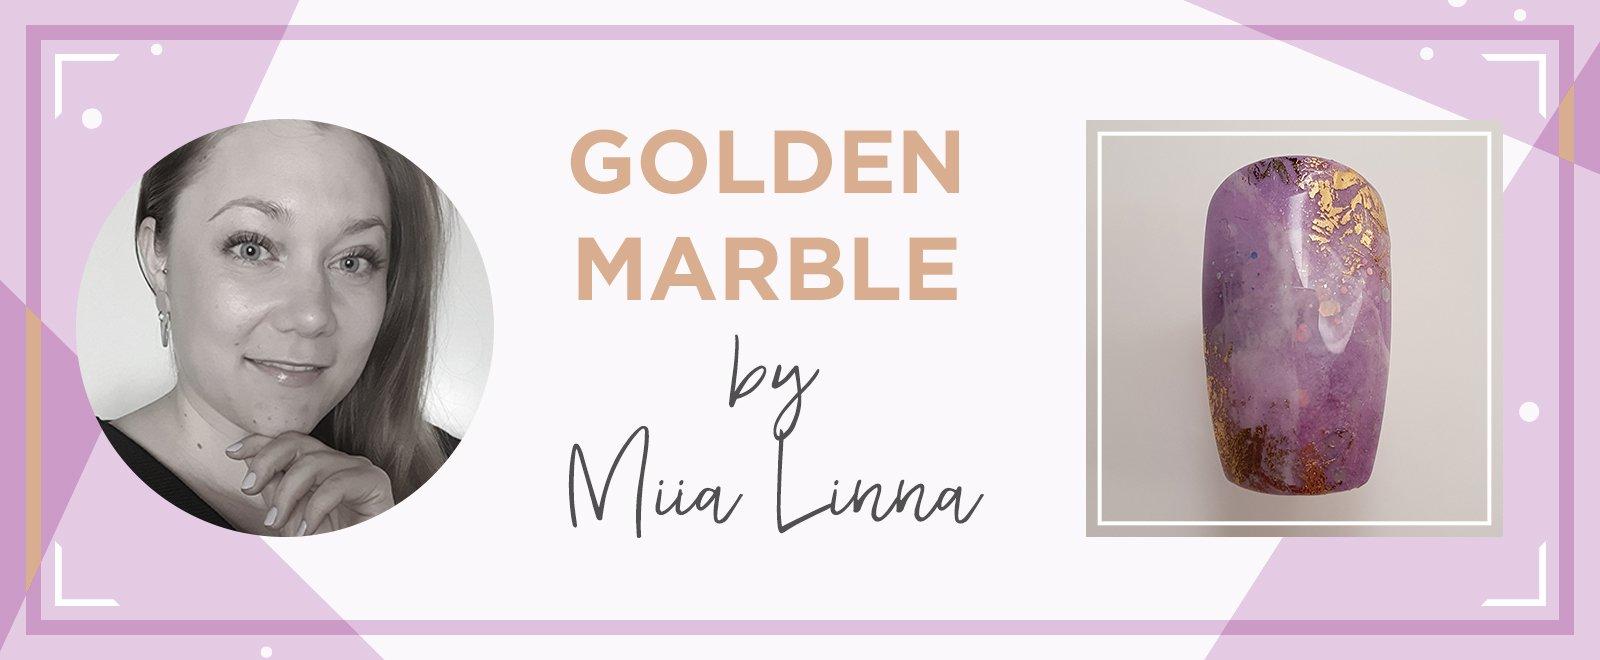 SBS_header_template_1600x660_golden-marble_Miia-Linna